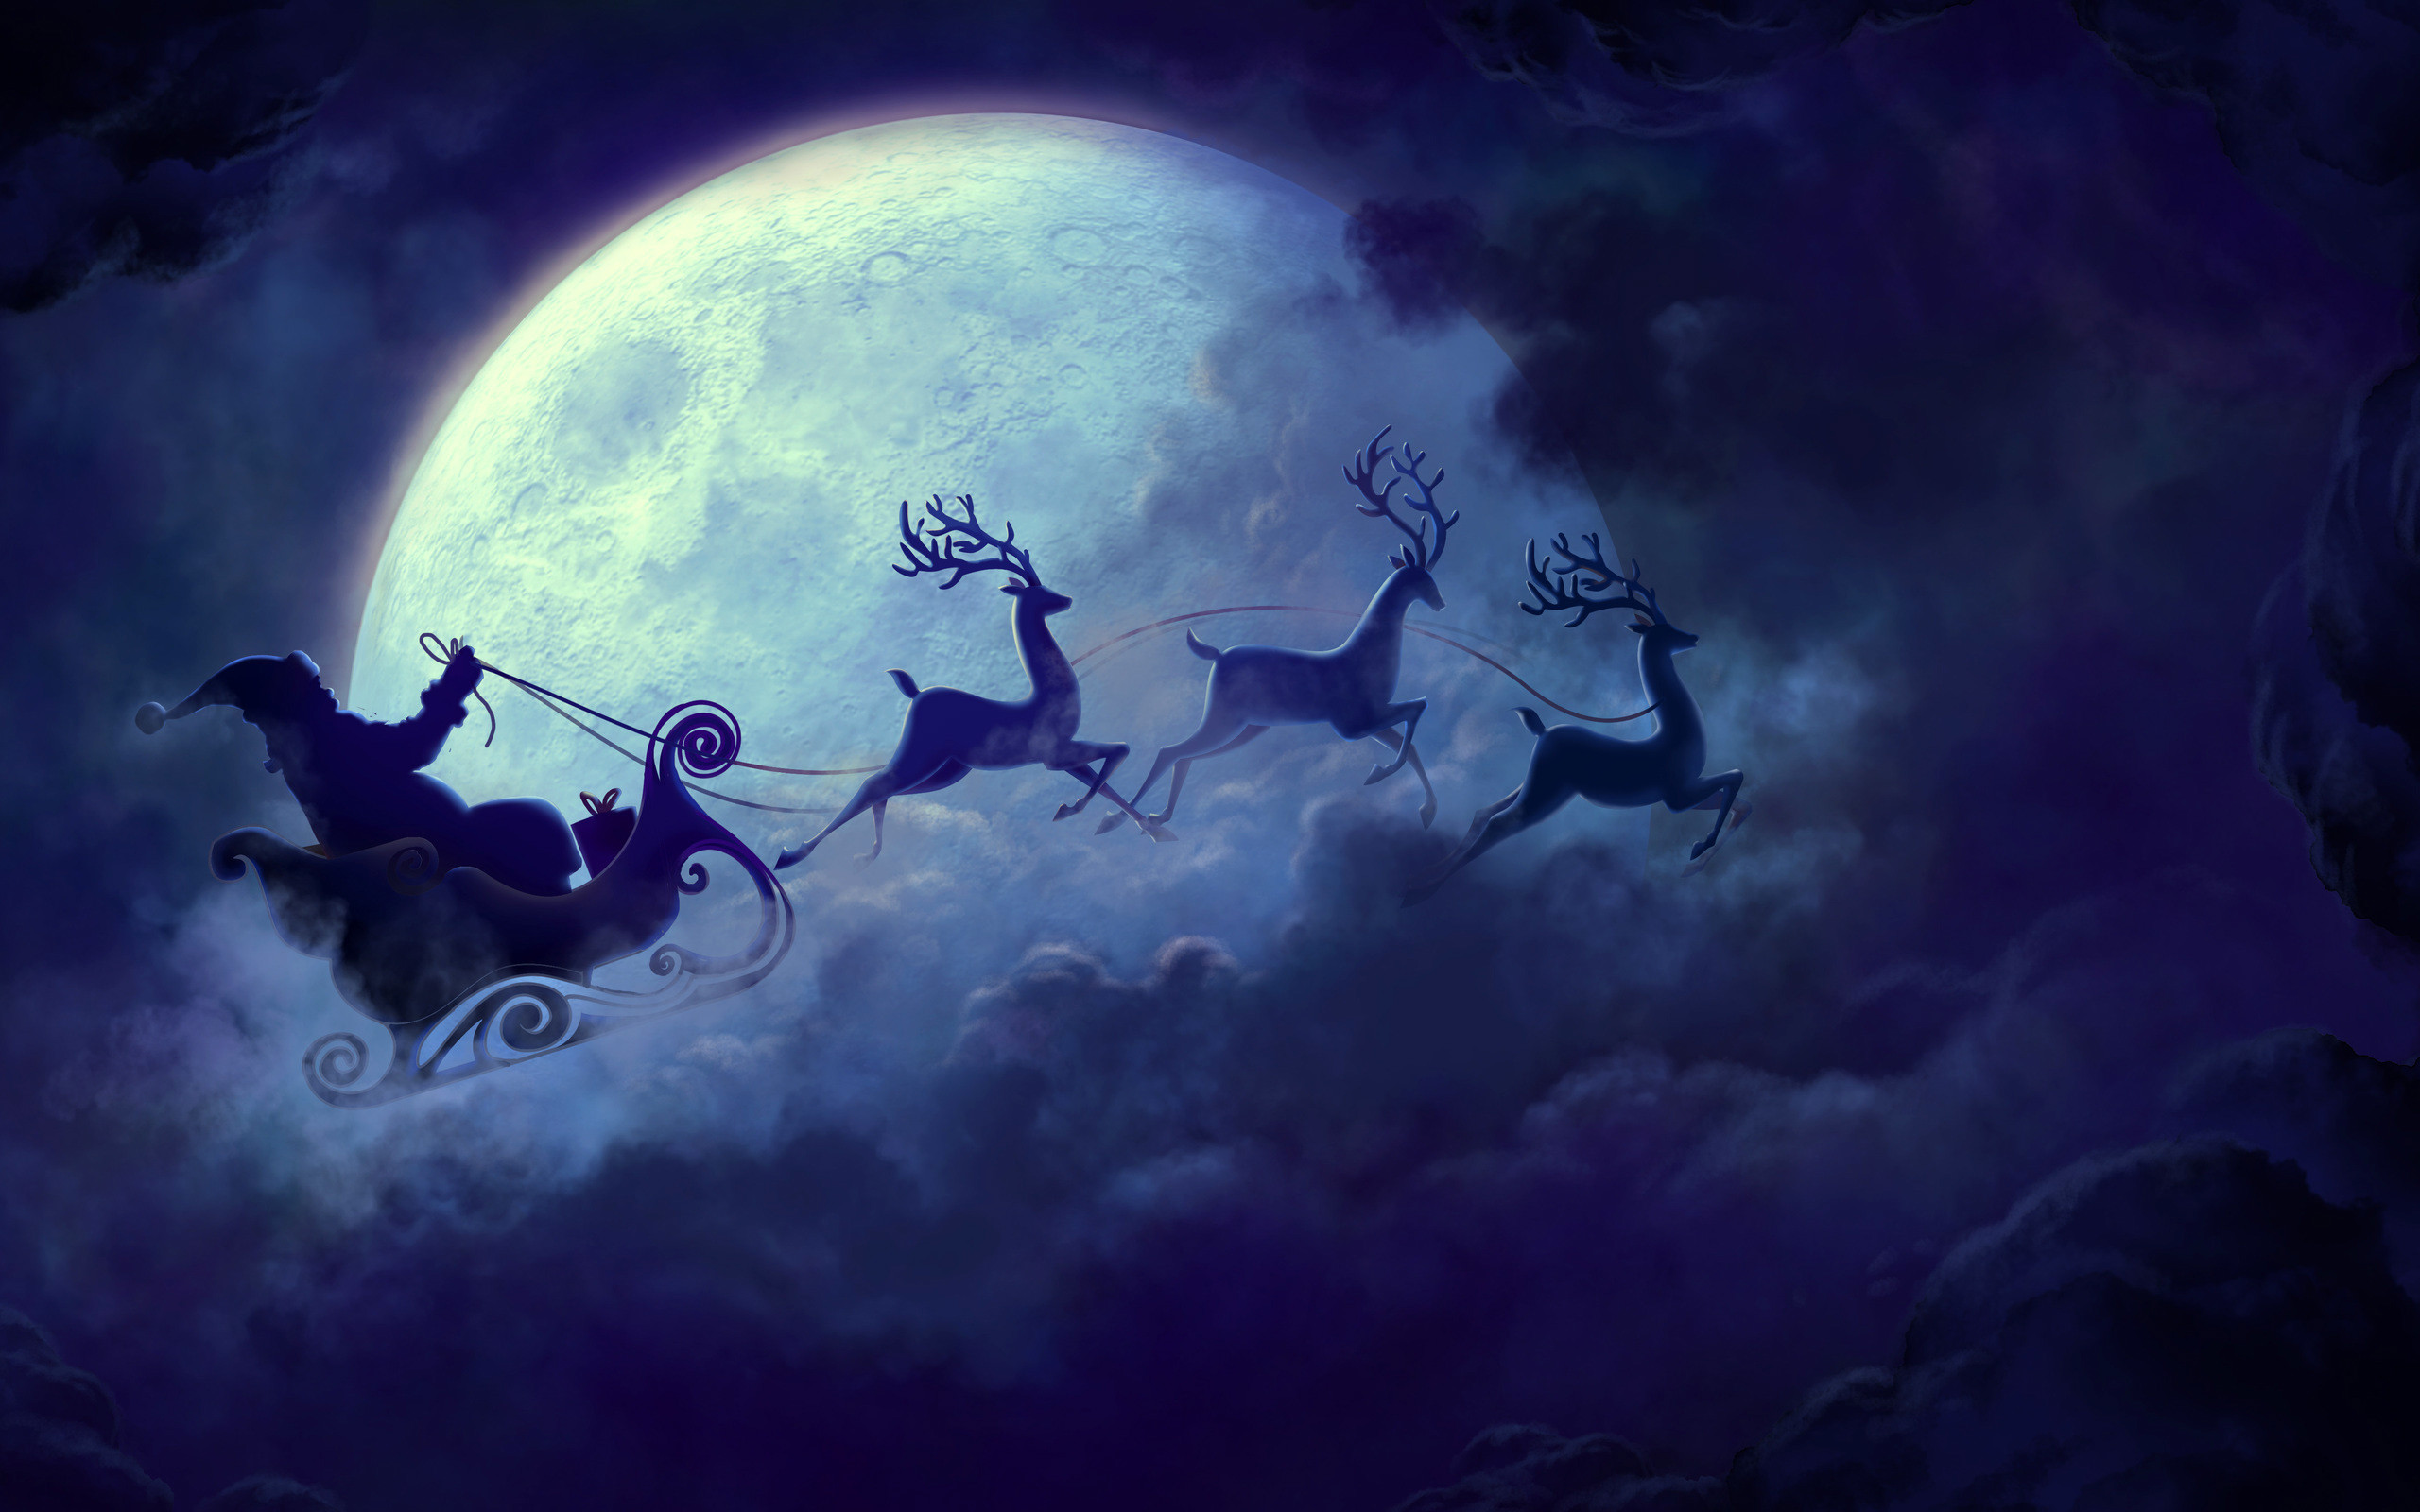 Celebrations / Christmas / Santa Claus Wallpaper